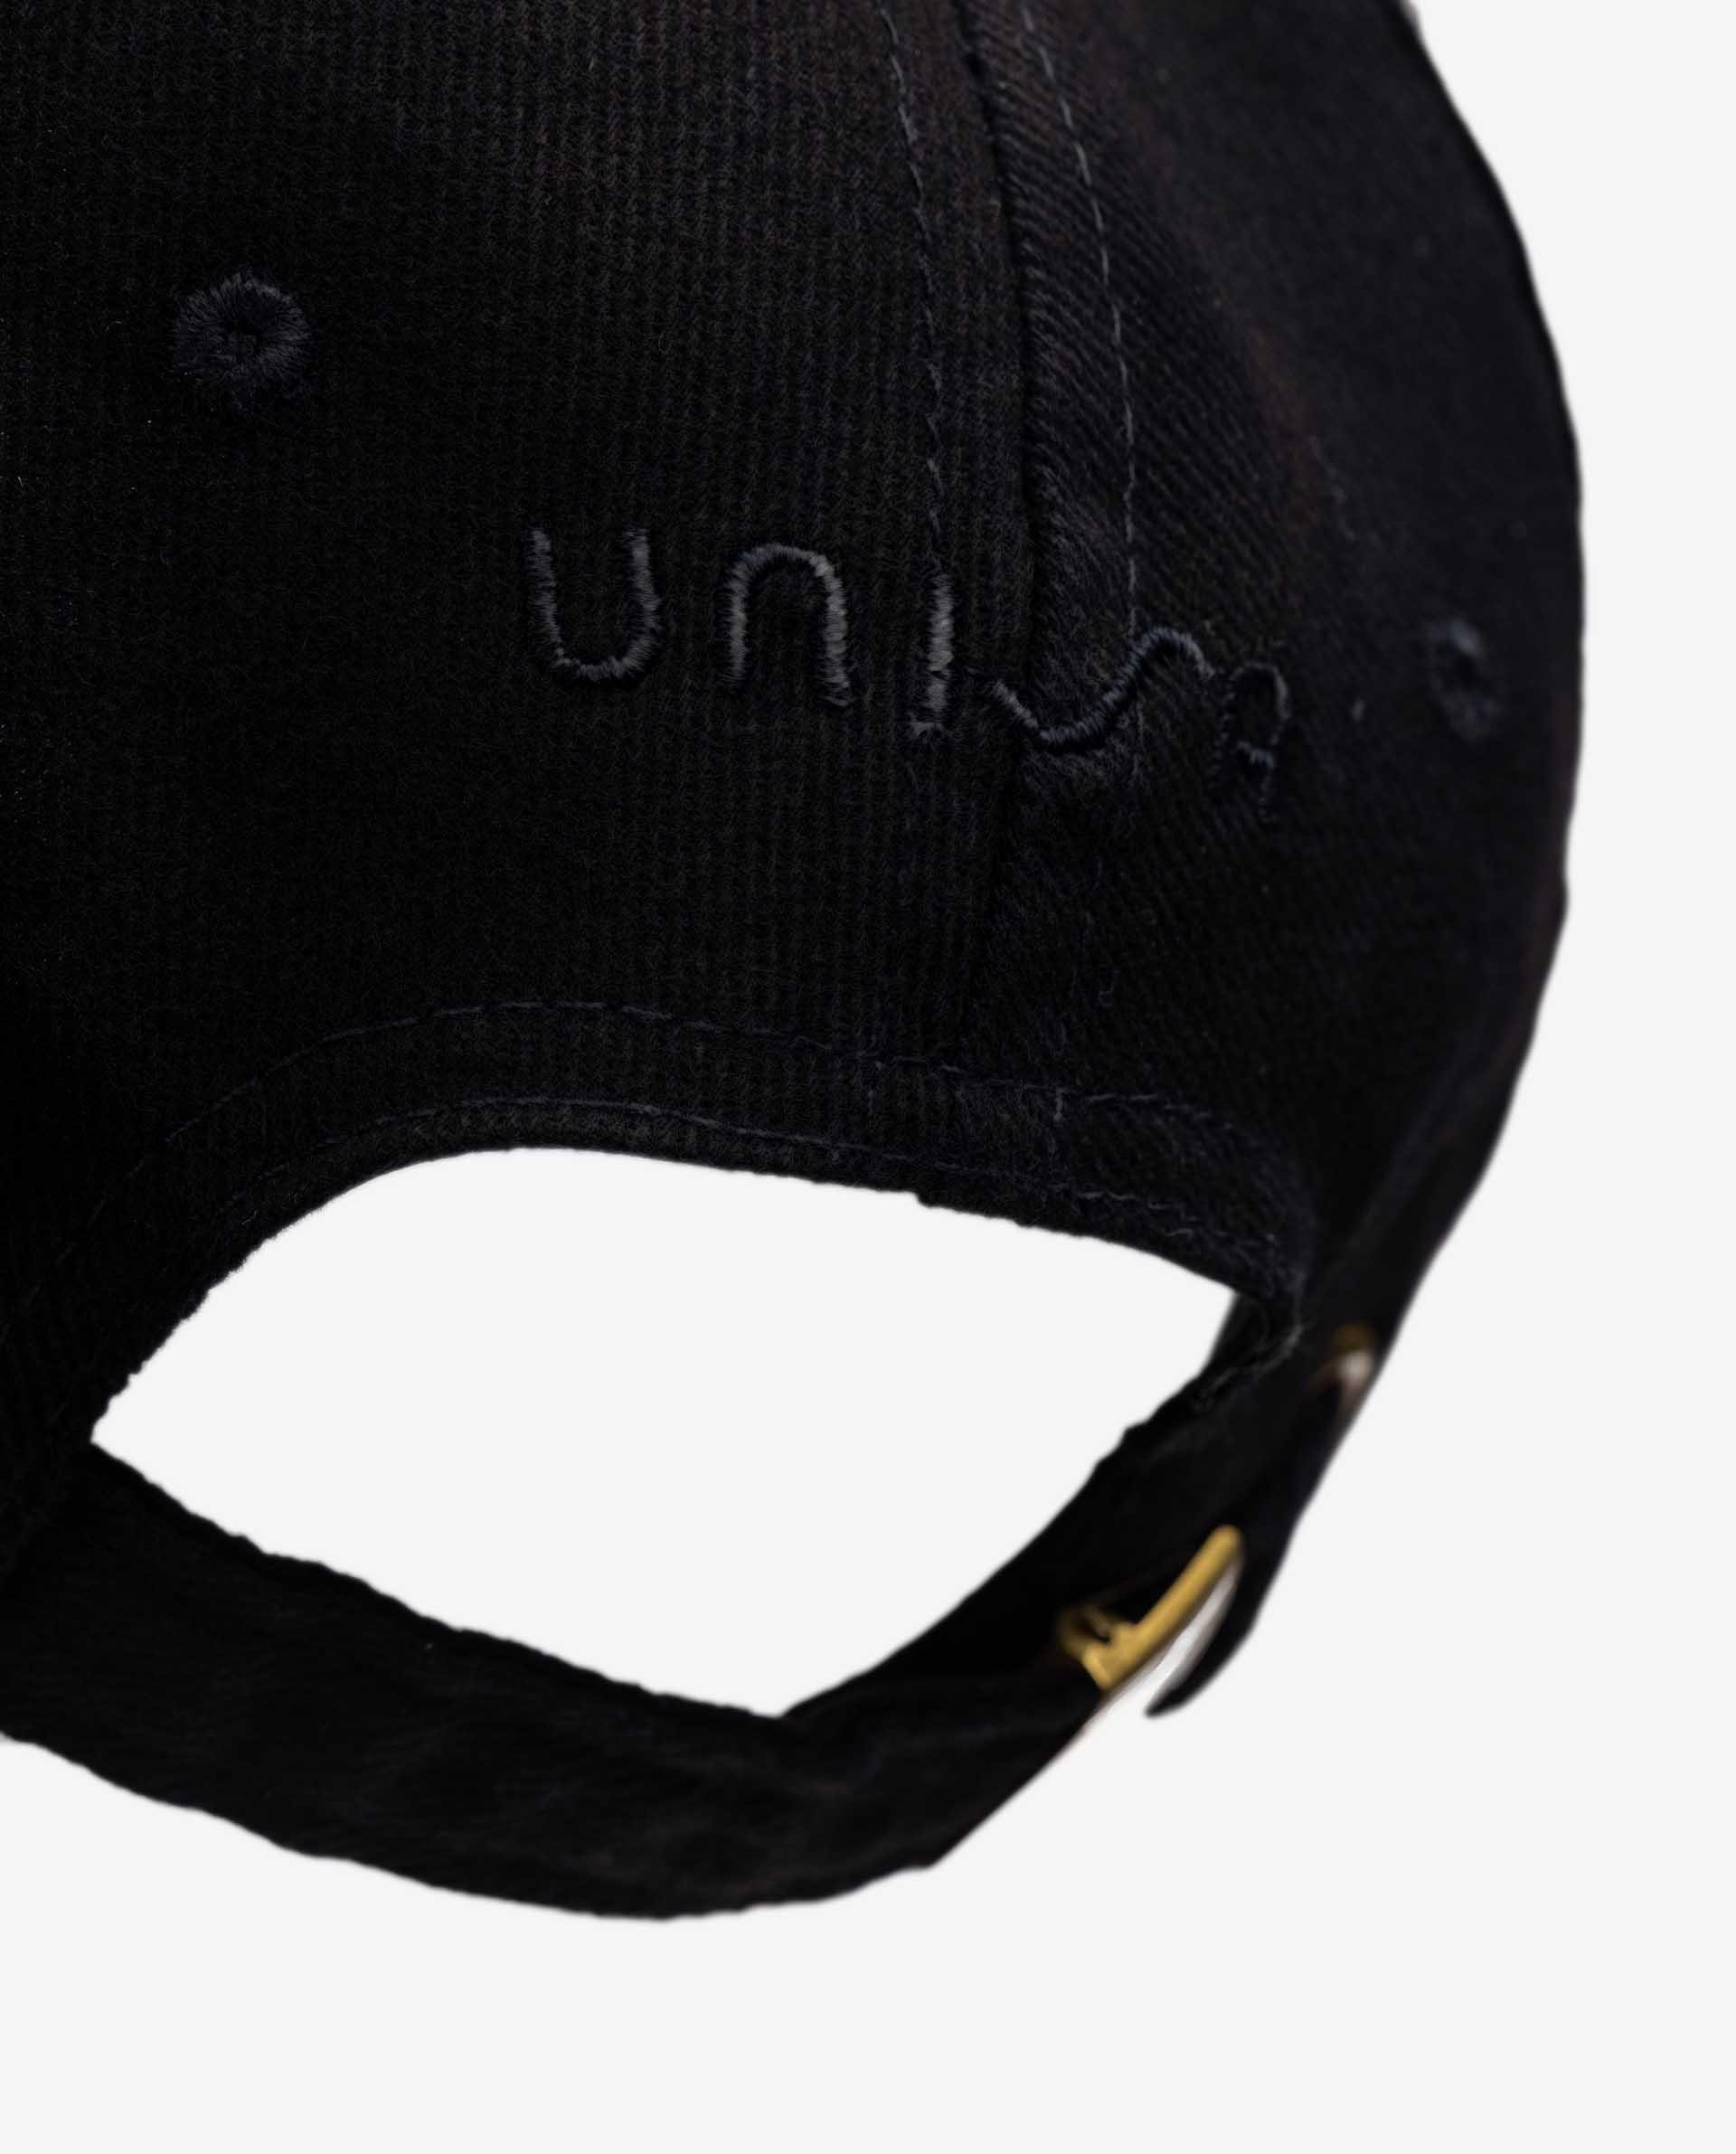 Unisa Gorras y sombreros GORRA_UNI black 1